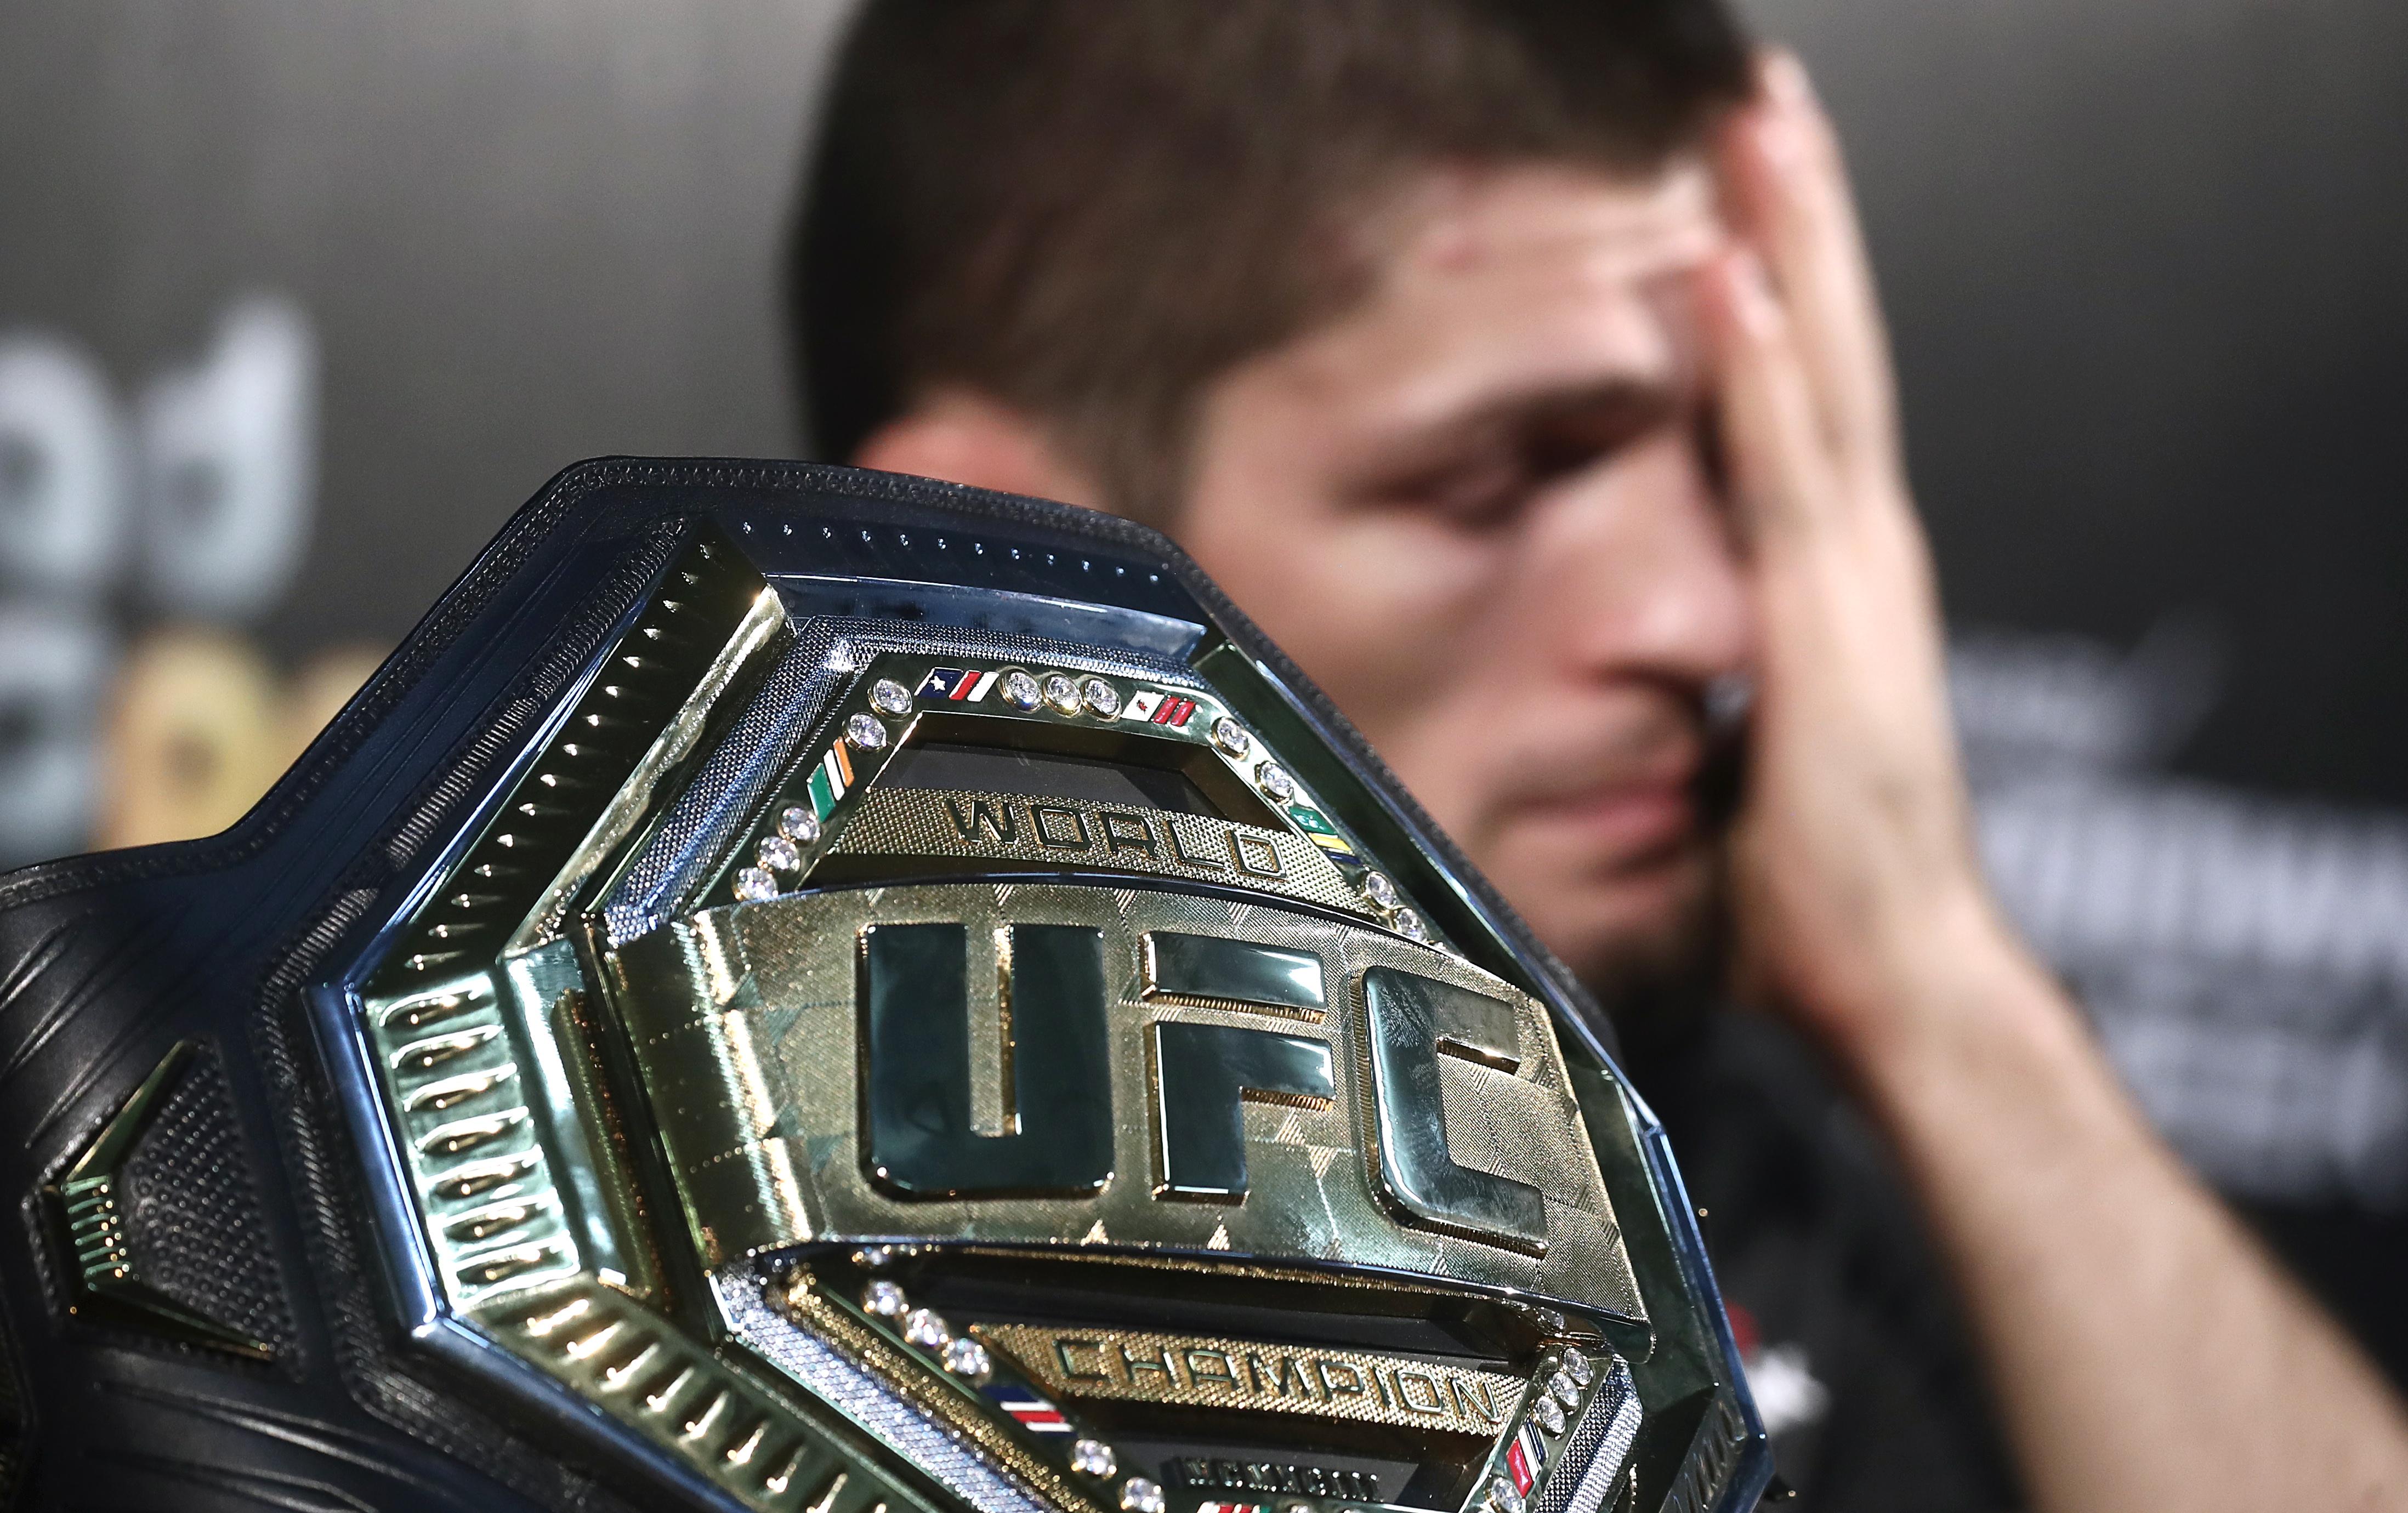 UFC lightweight champion Nurmagomedov defends his title